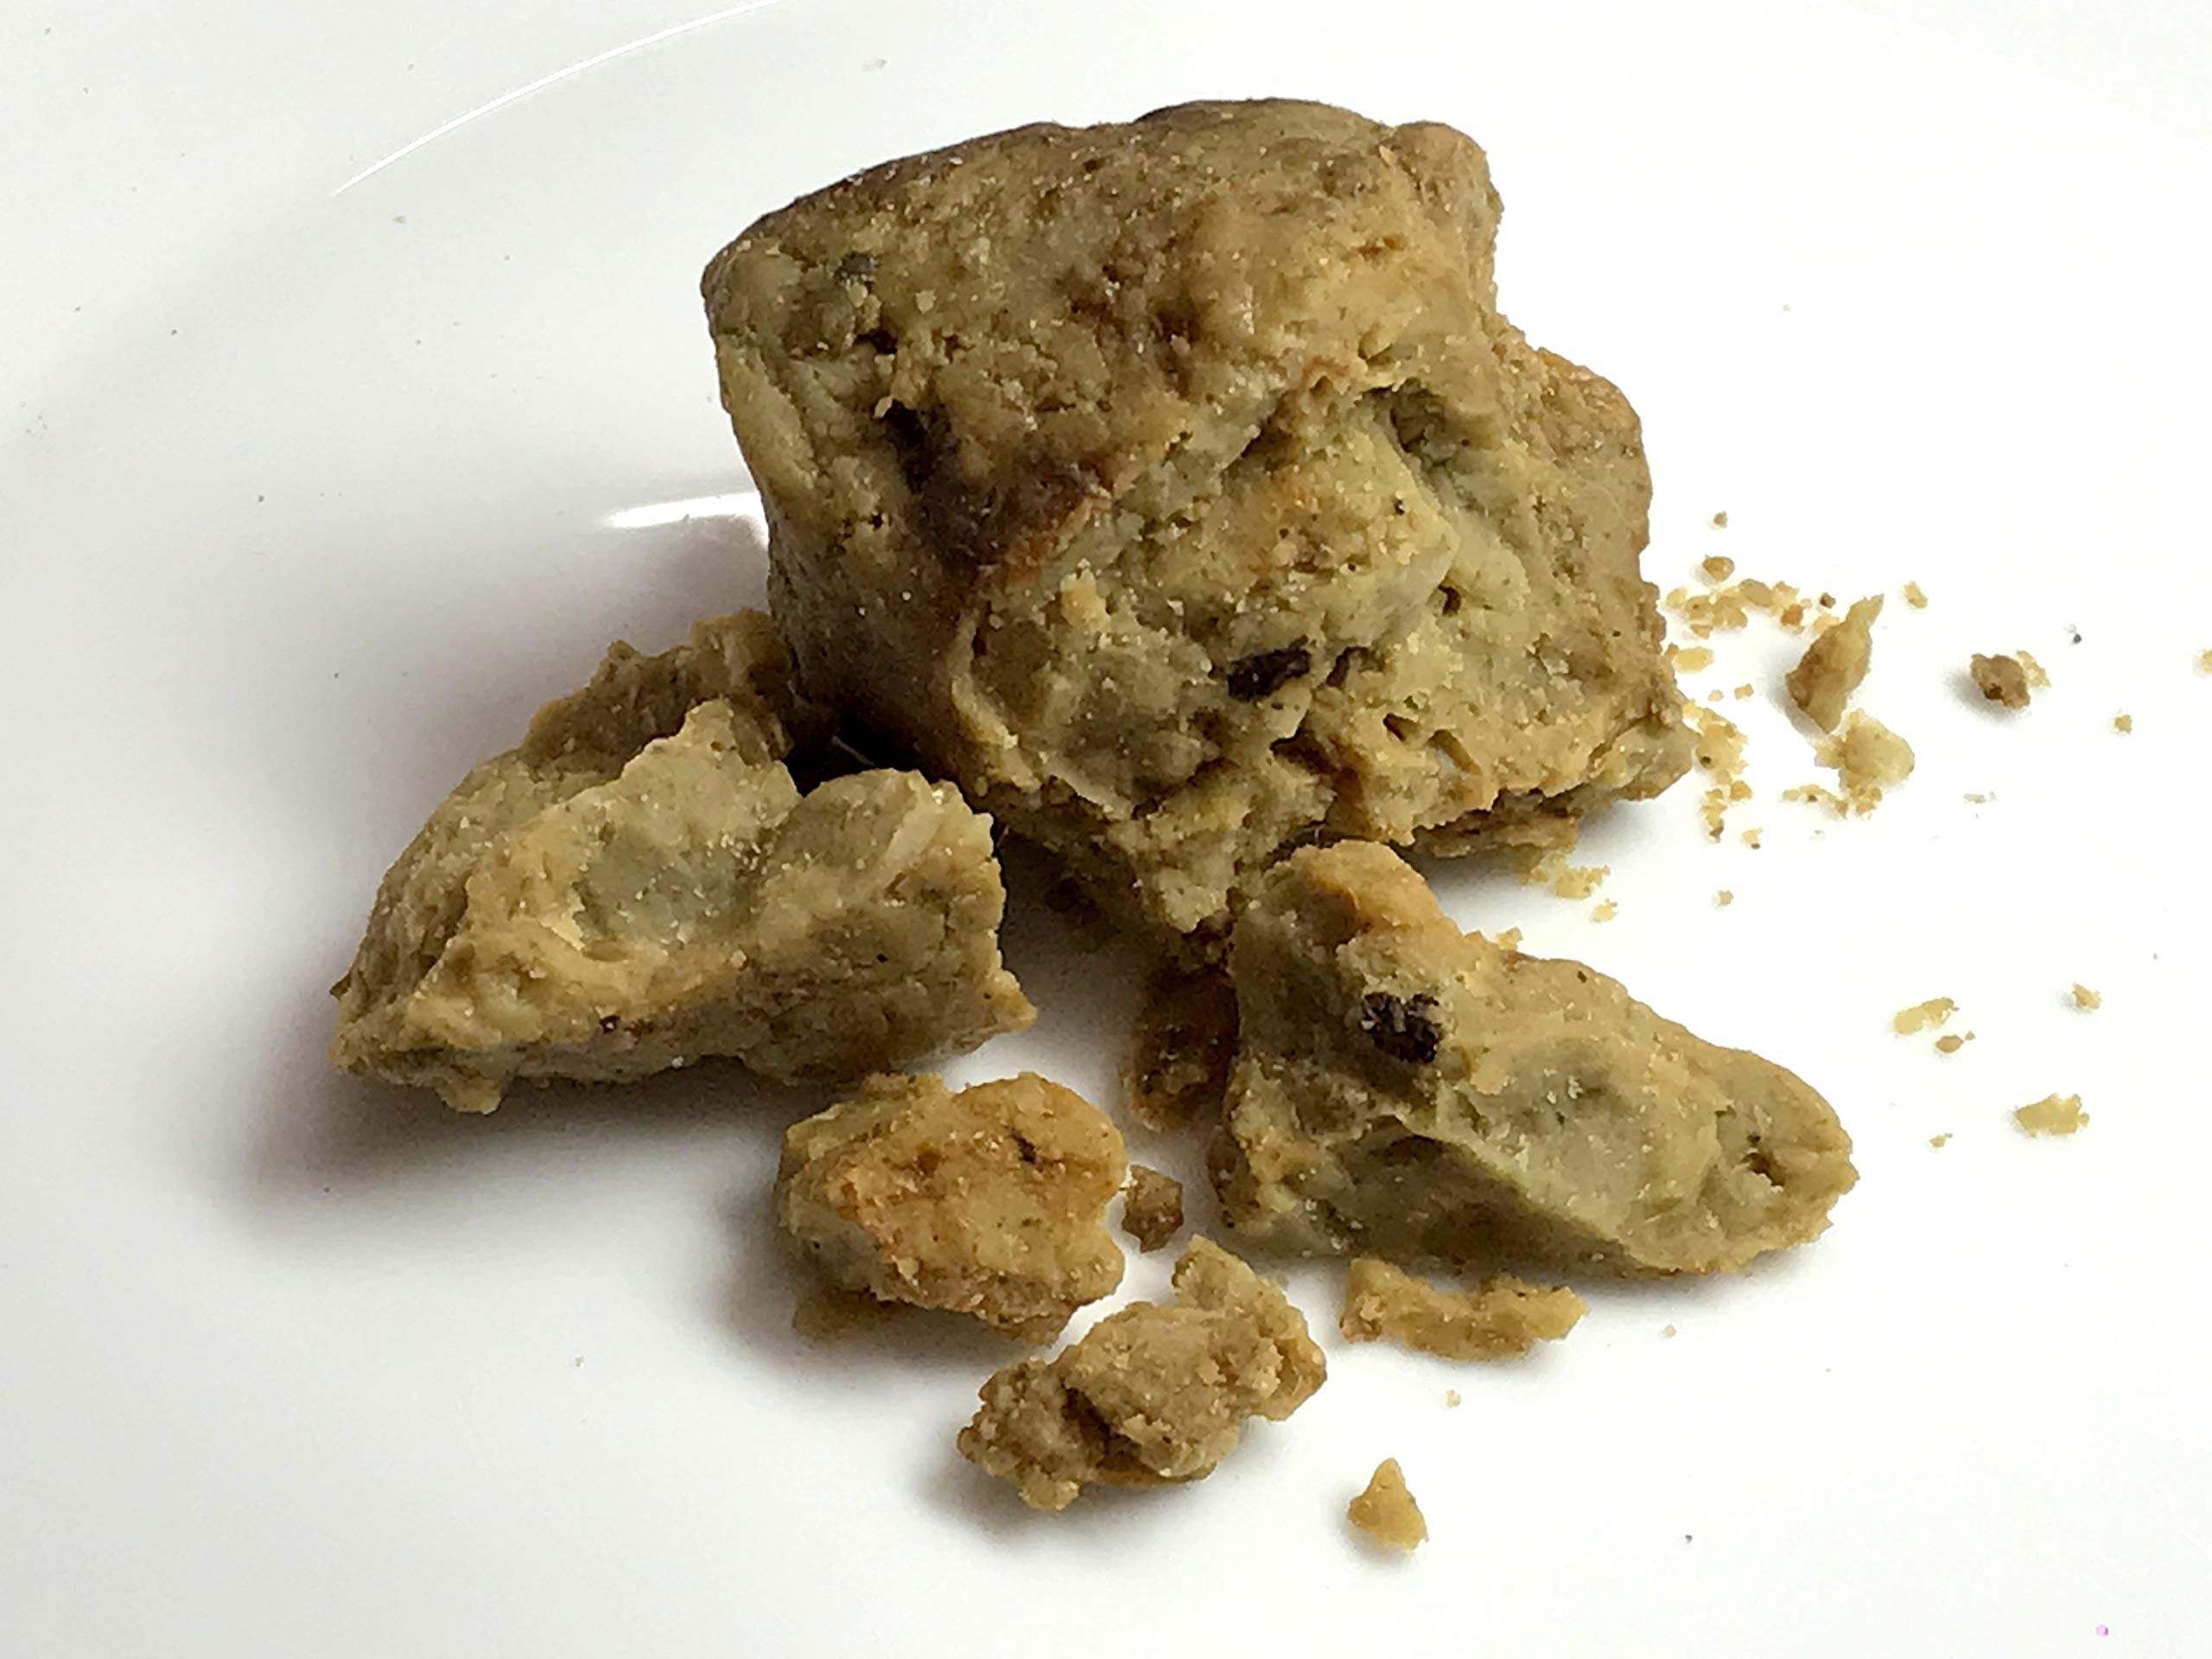 Pure Asafoetida Hing Whole Heeng, Organic Premium Quality With Fresh aroma (1) by SANAA ZESTY (Image #2)